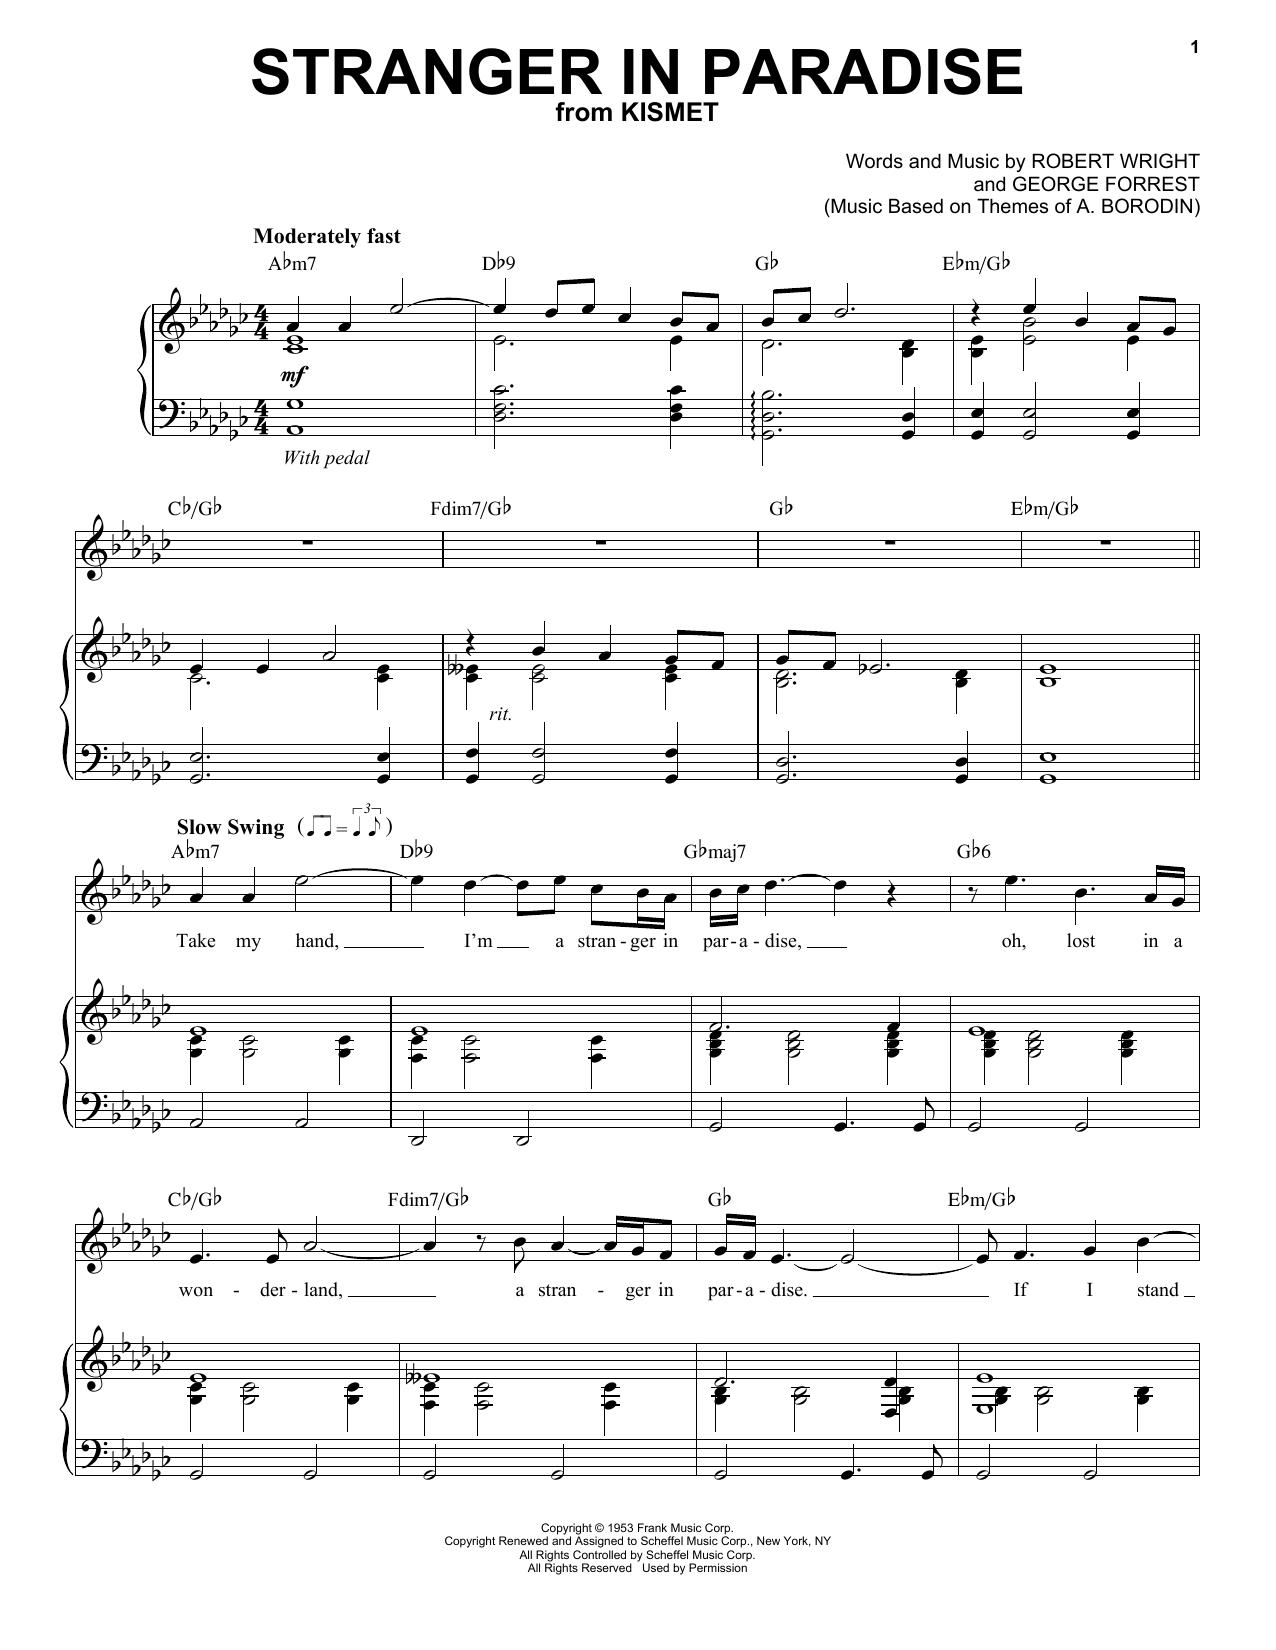 Tony Bennett Stranger In Paradise sheet music notes and chords